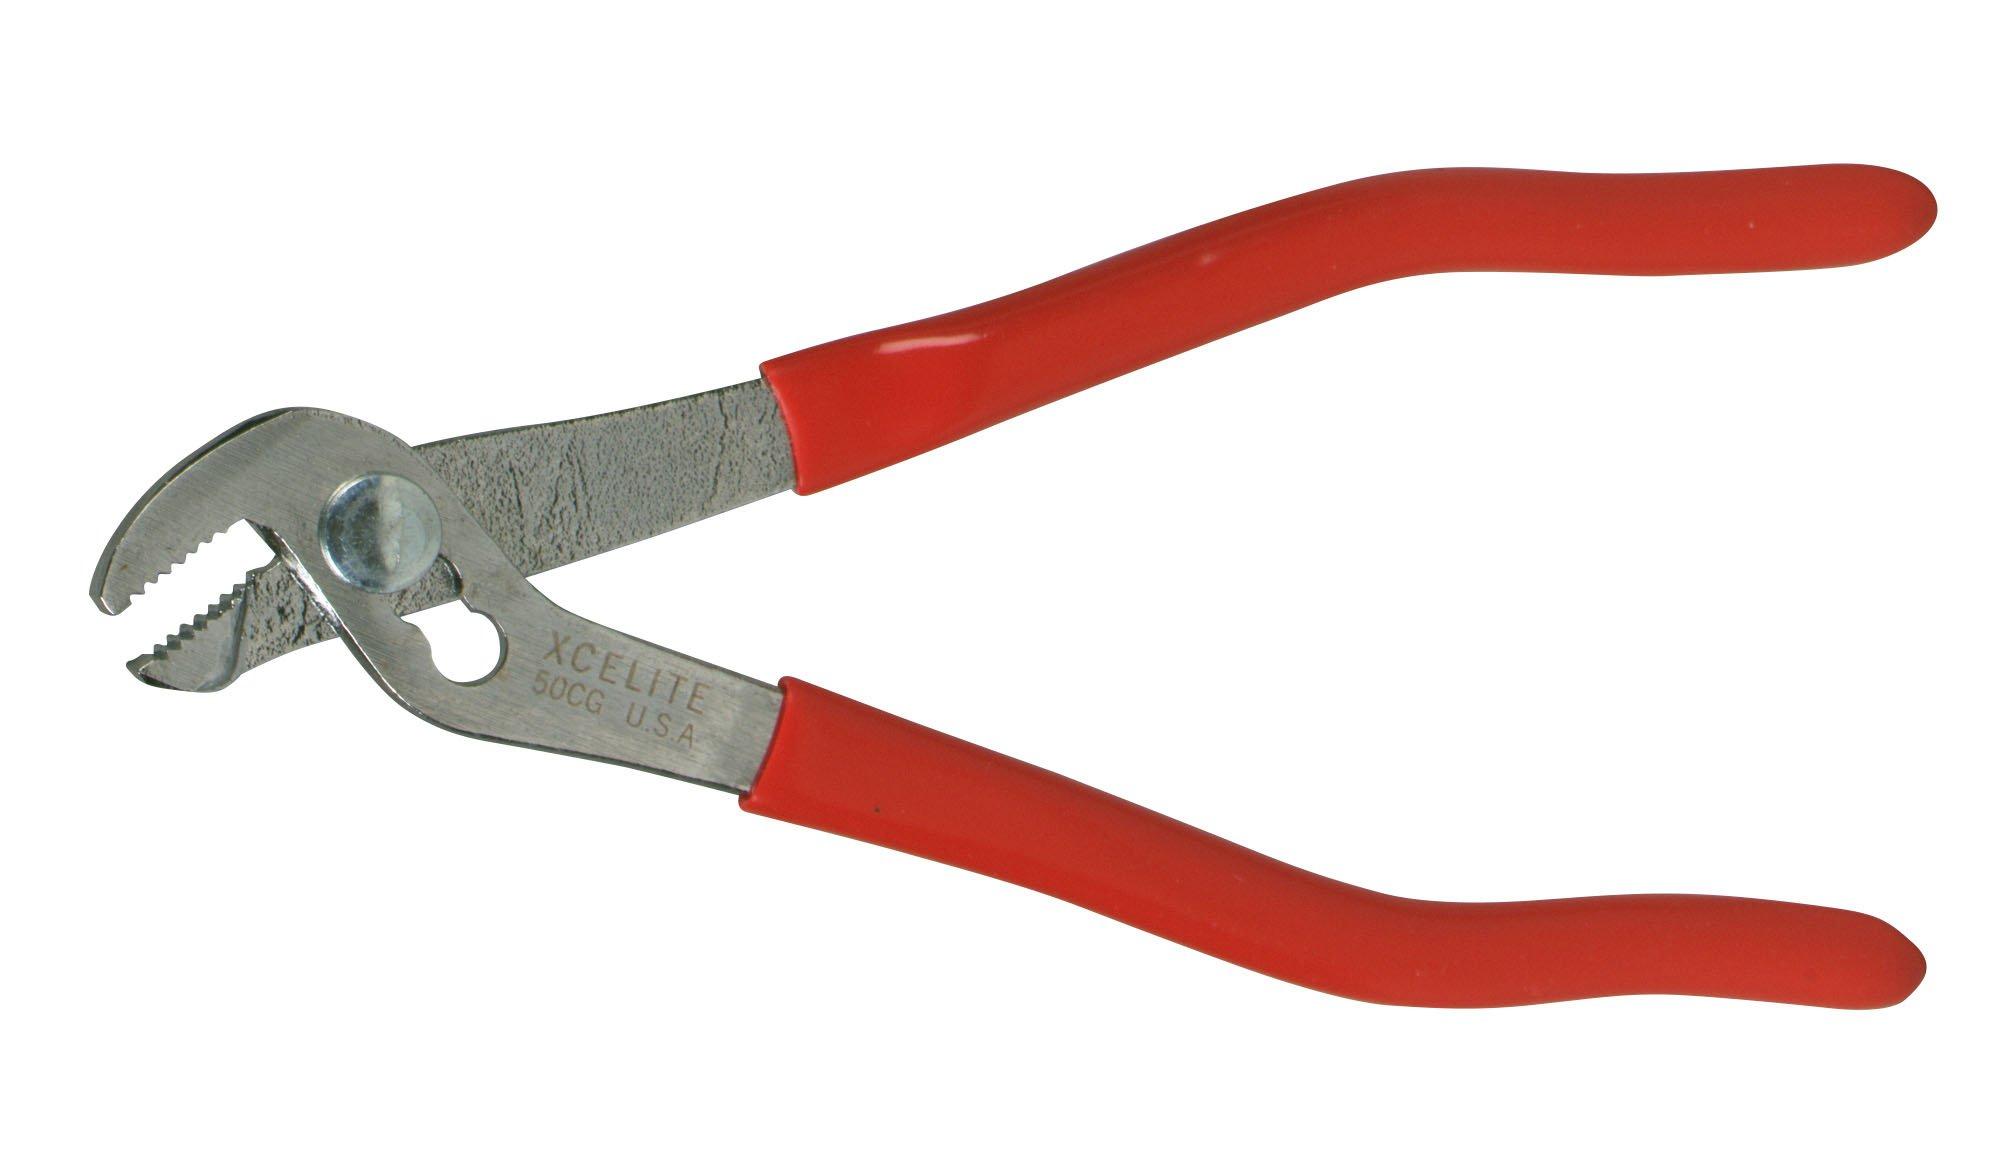 Erem 576TX1 Carbide Tip Diagonal Cutter, Super Full Flush Cut, 4-1/4'' Length, 7/16'' Jaw Length